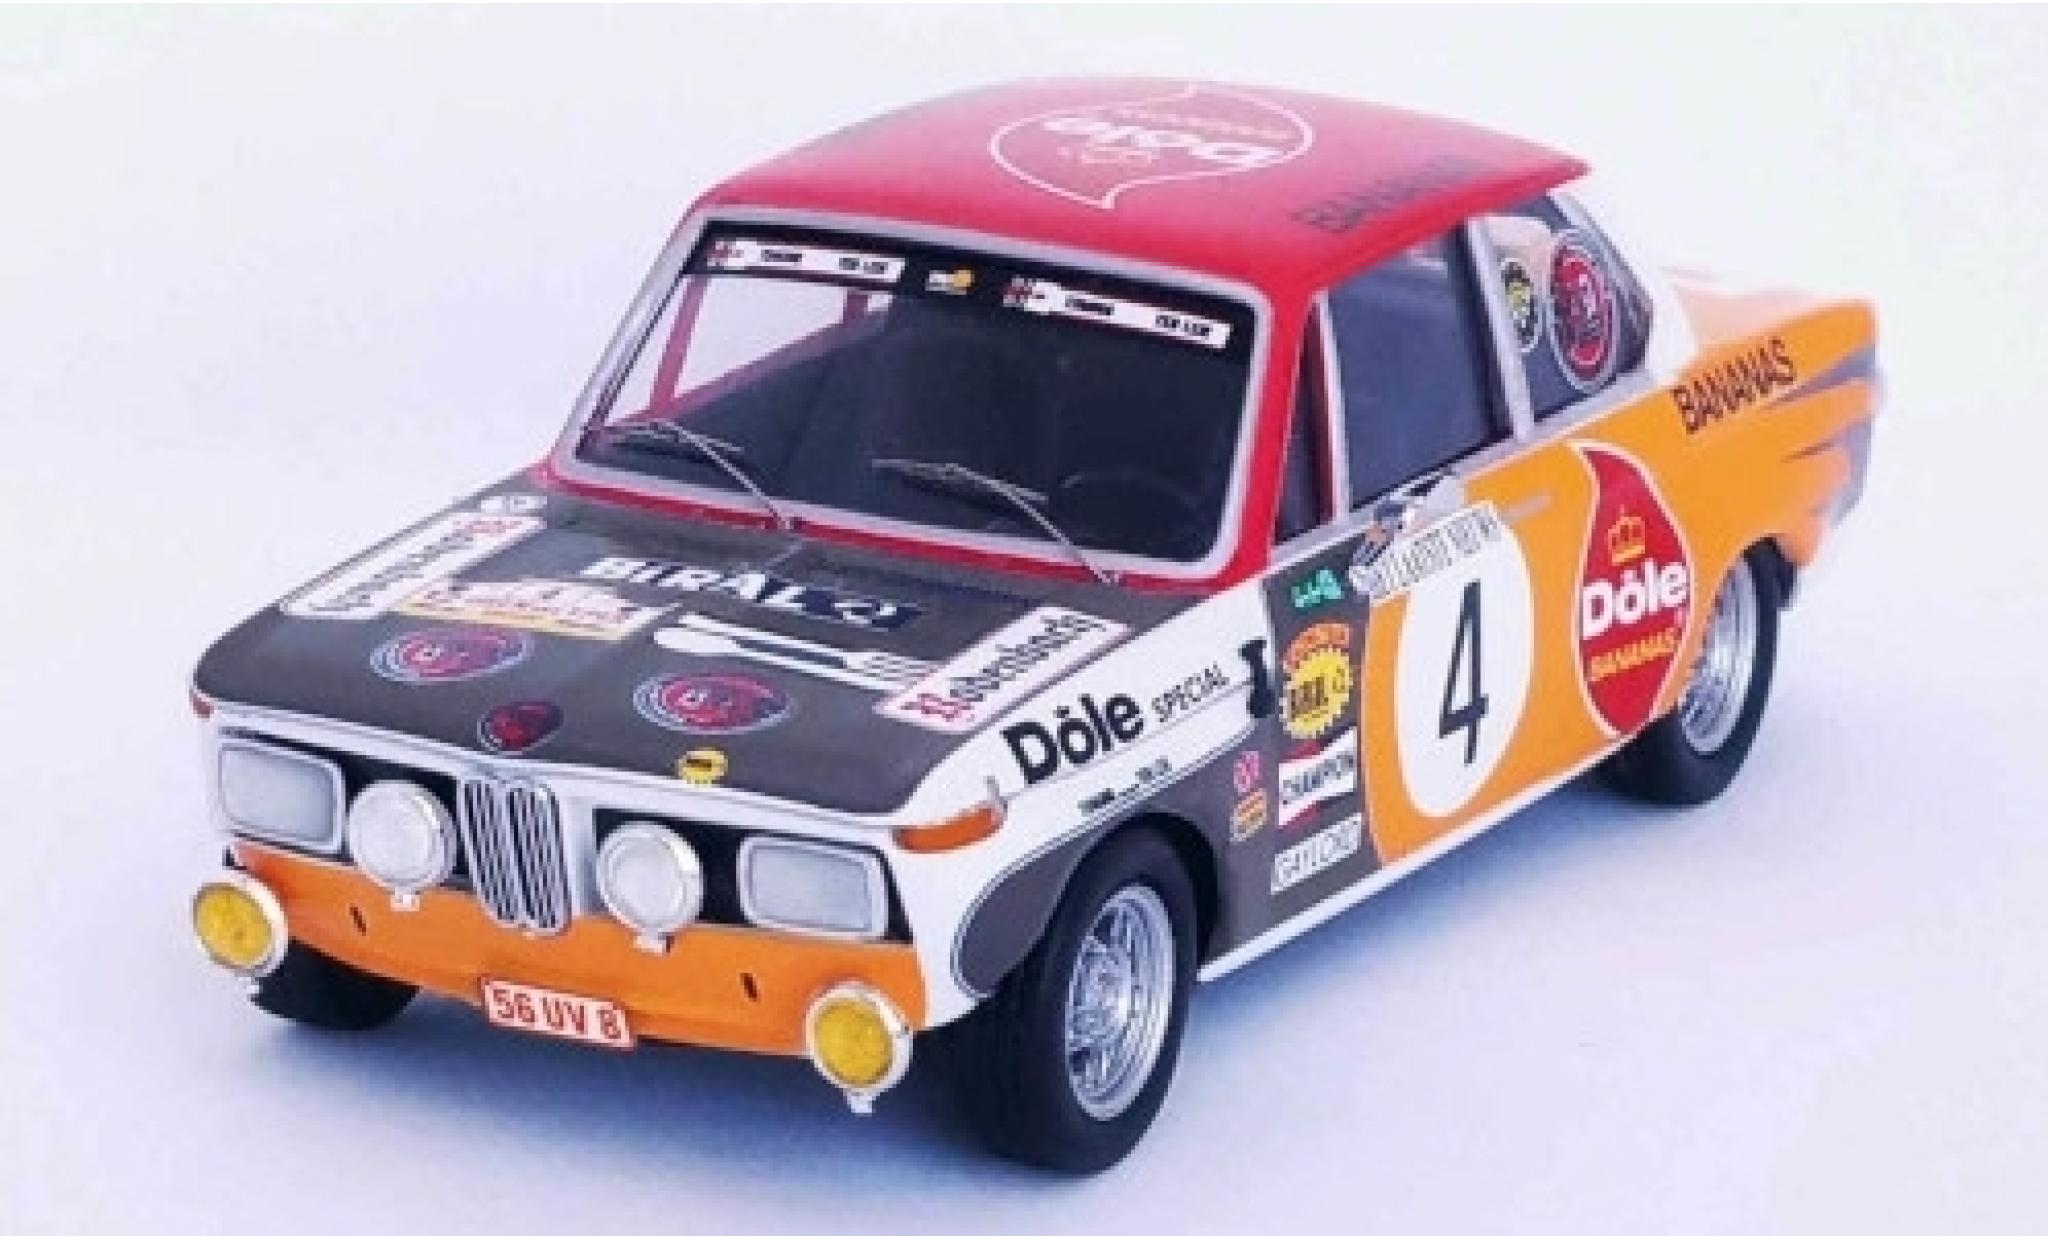 Bmw 2002 1/43 Trofeu ti No.4 Dole Bananas Rally Ypres 1973 Pedro/Jimmy